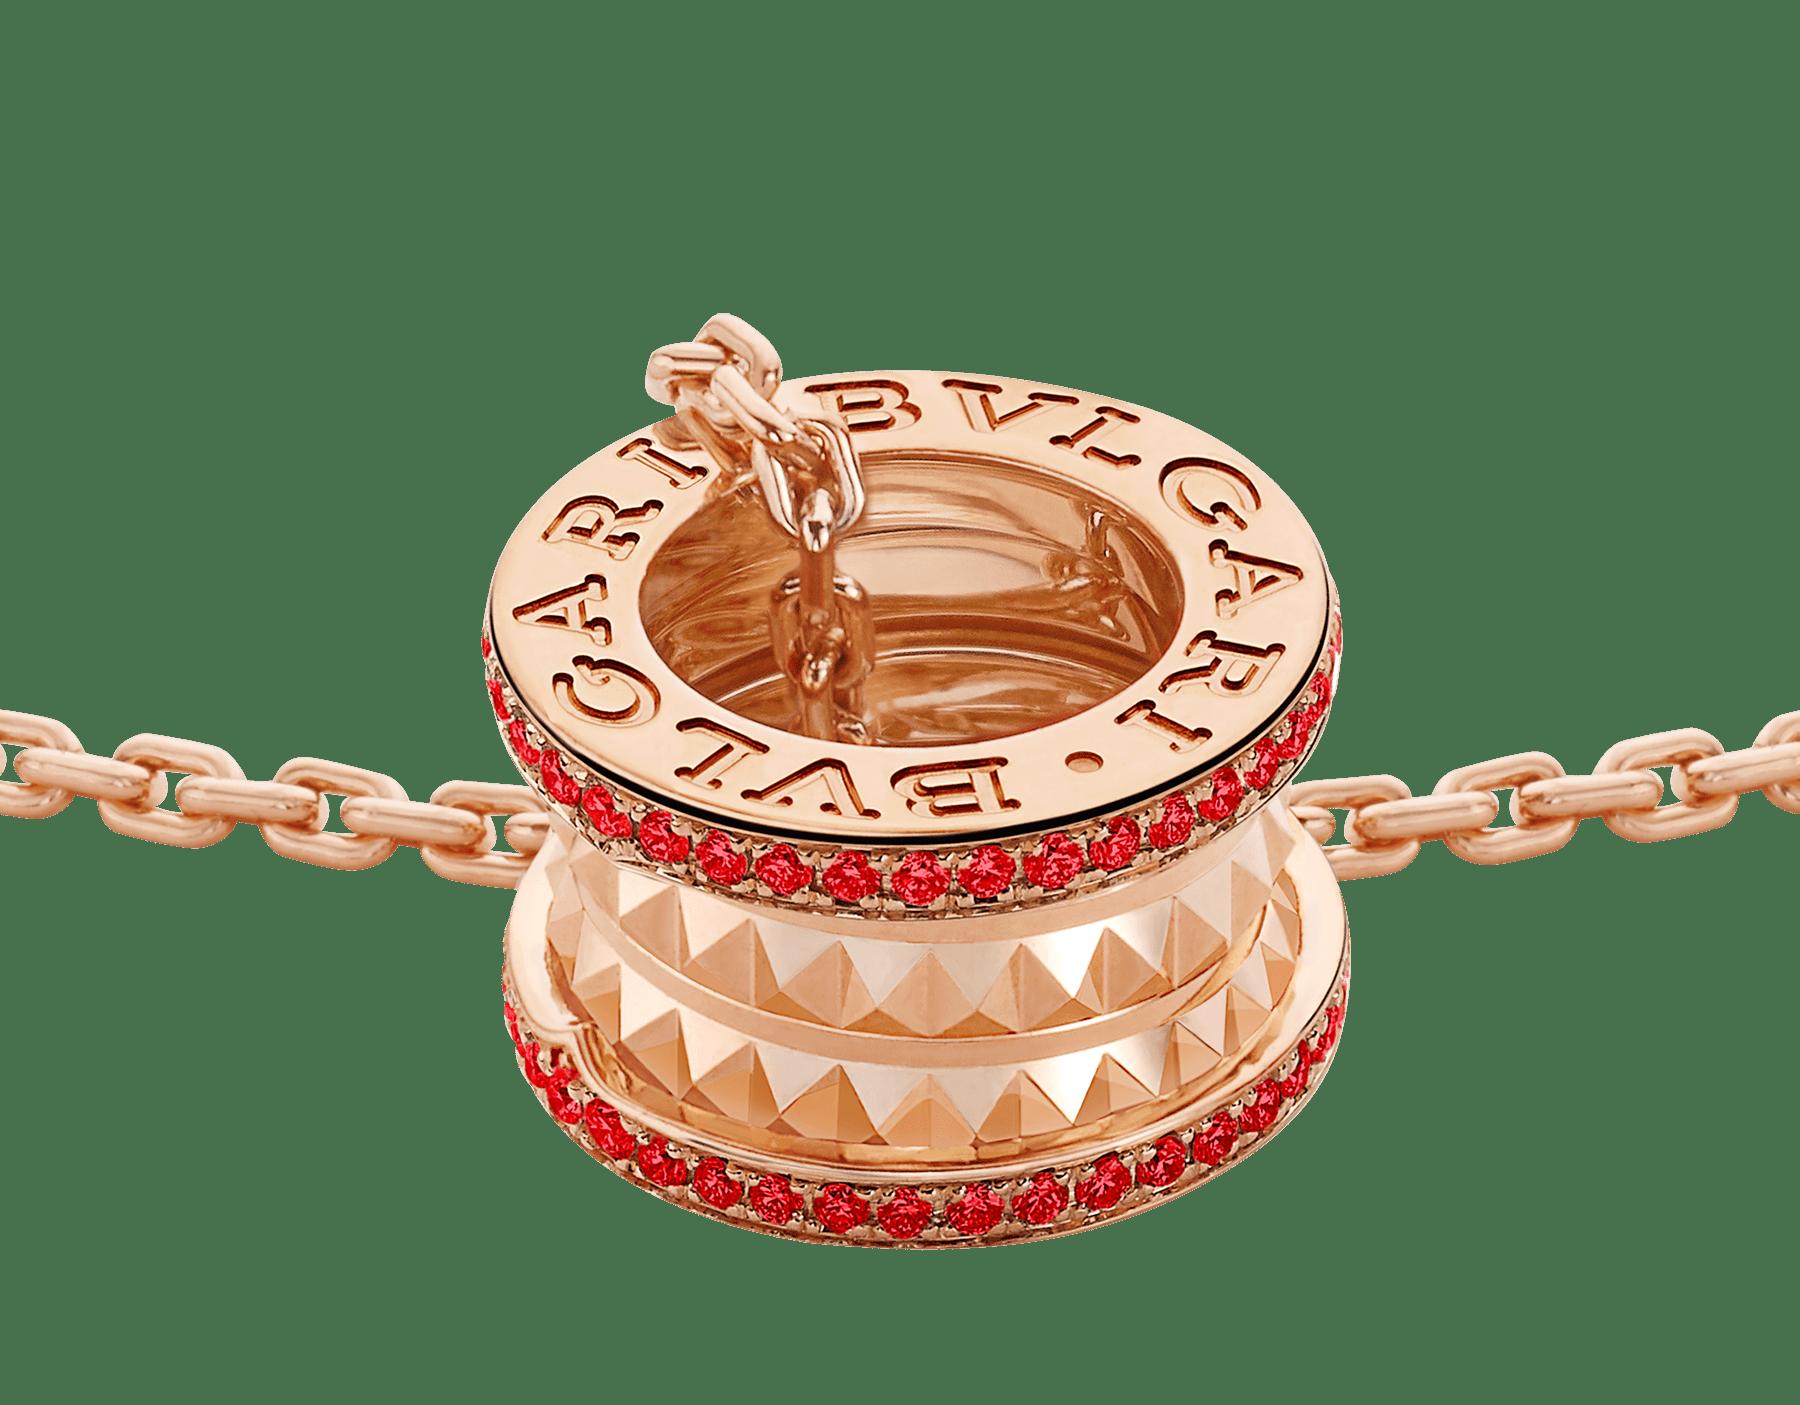 BVLGARI BVLGARI 18K 玫瑰金翻轉式戒指,鑲飾翡翠和密鑲鑽石。 358306 image 3